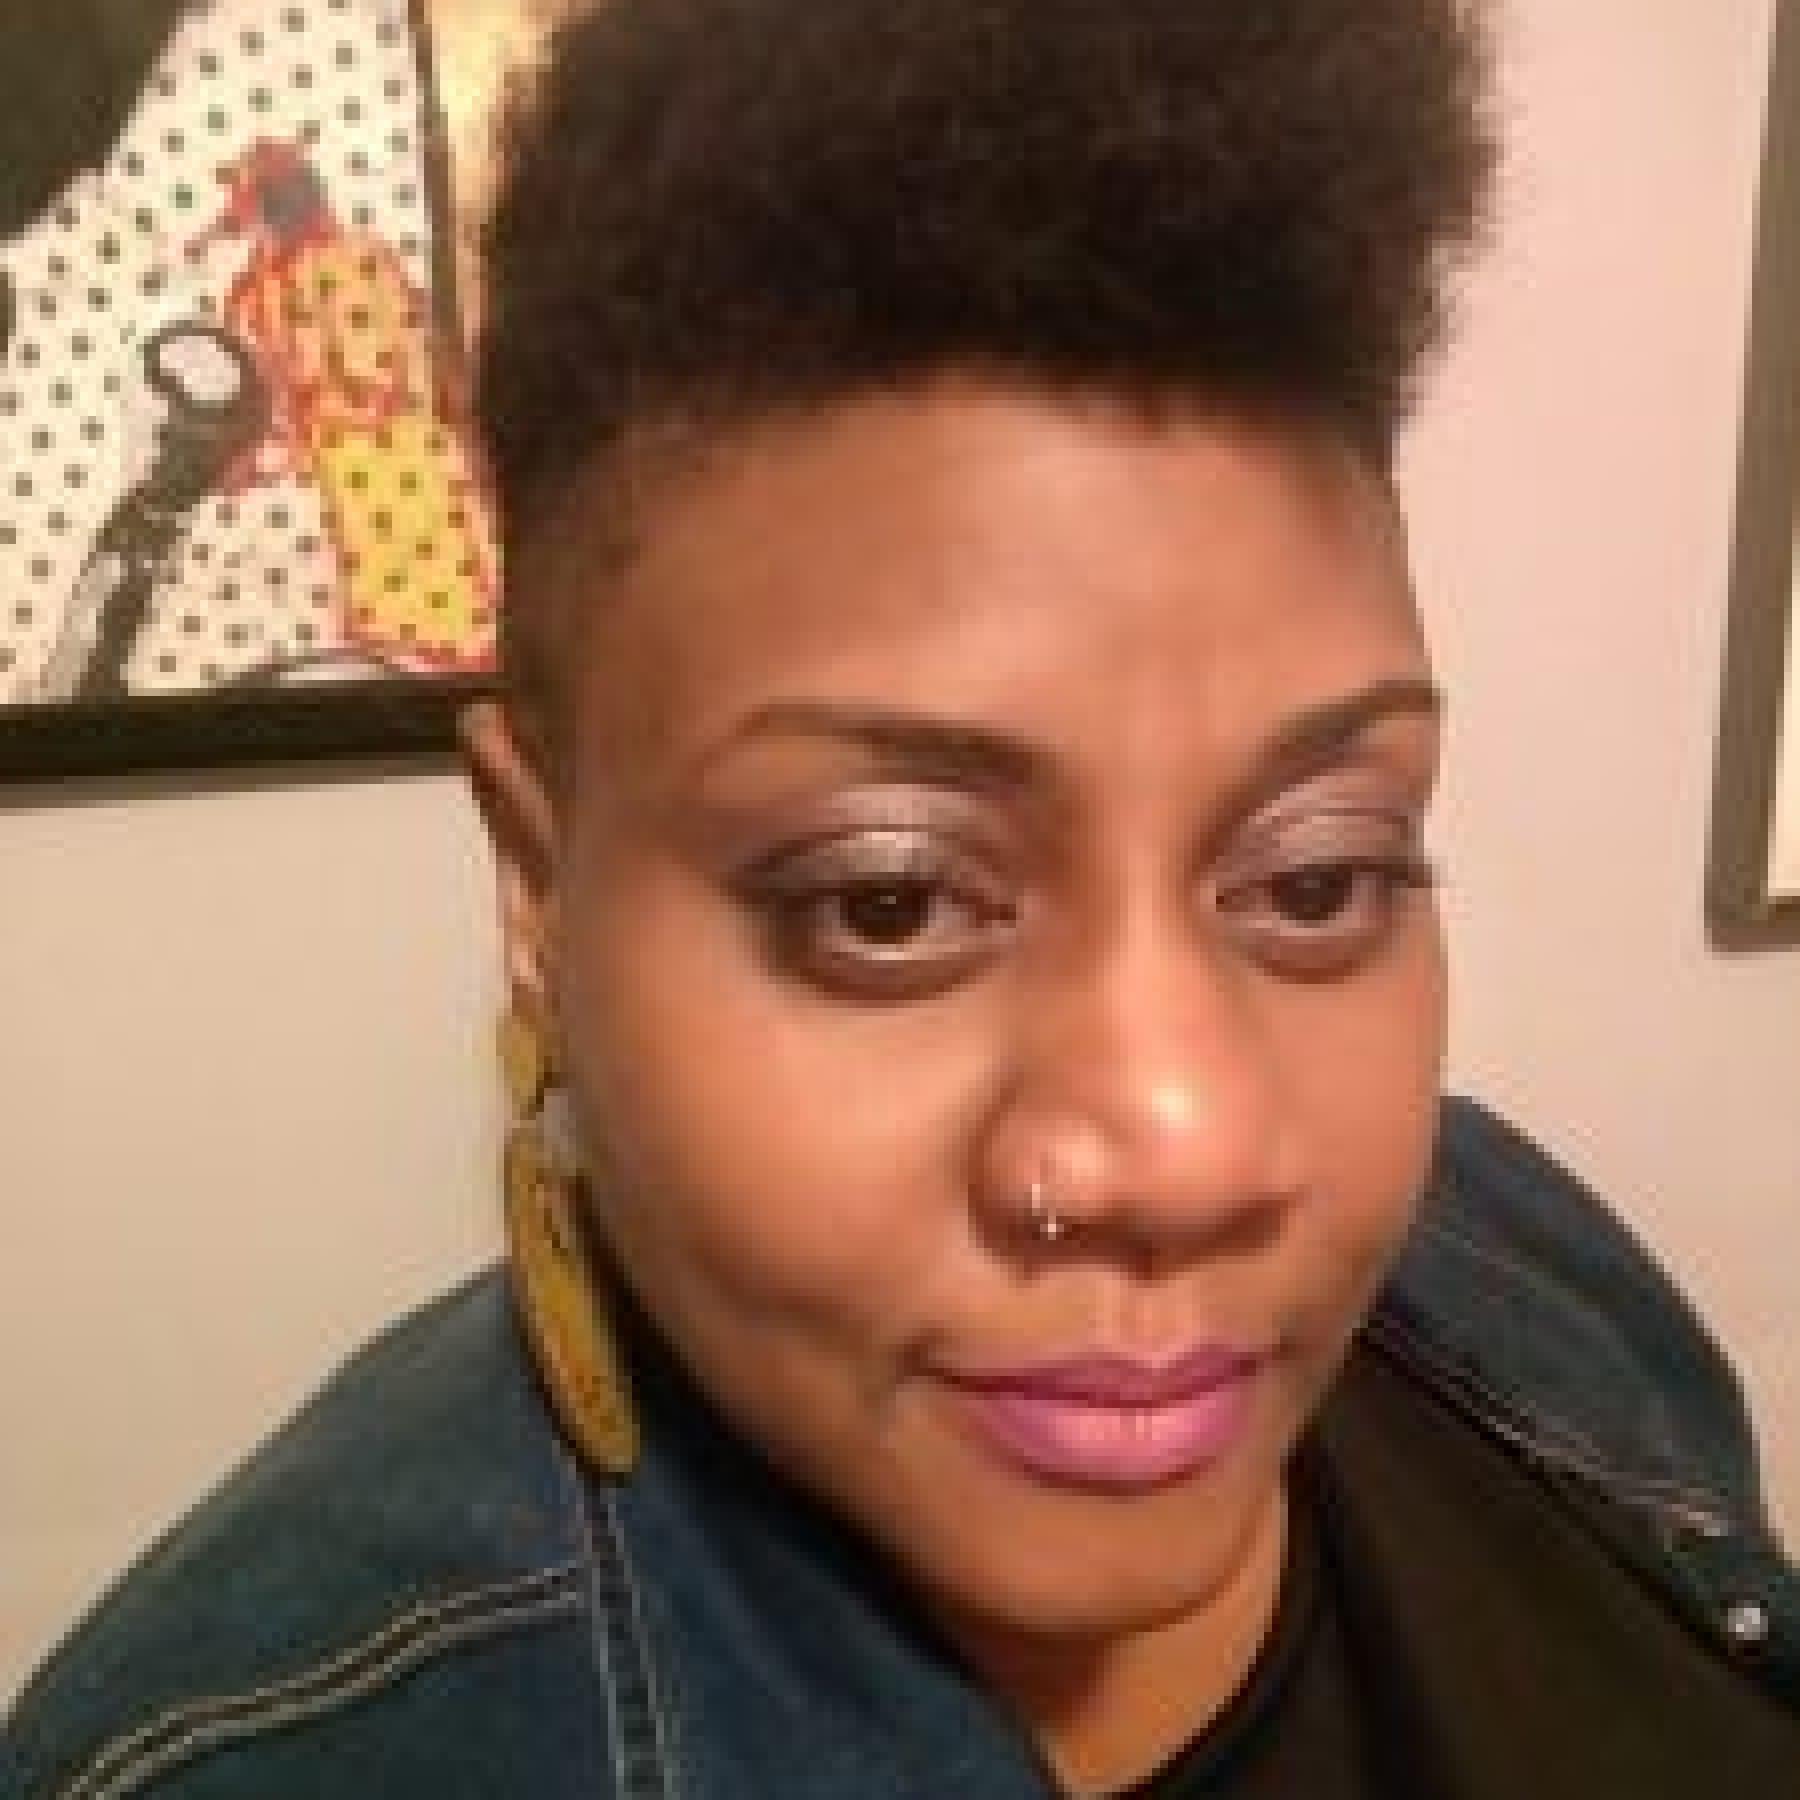 Headshot of Amena Johnson wearing a jean jacket and earrings